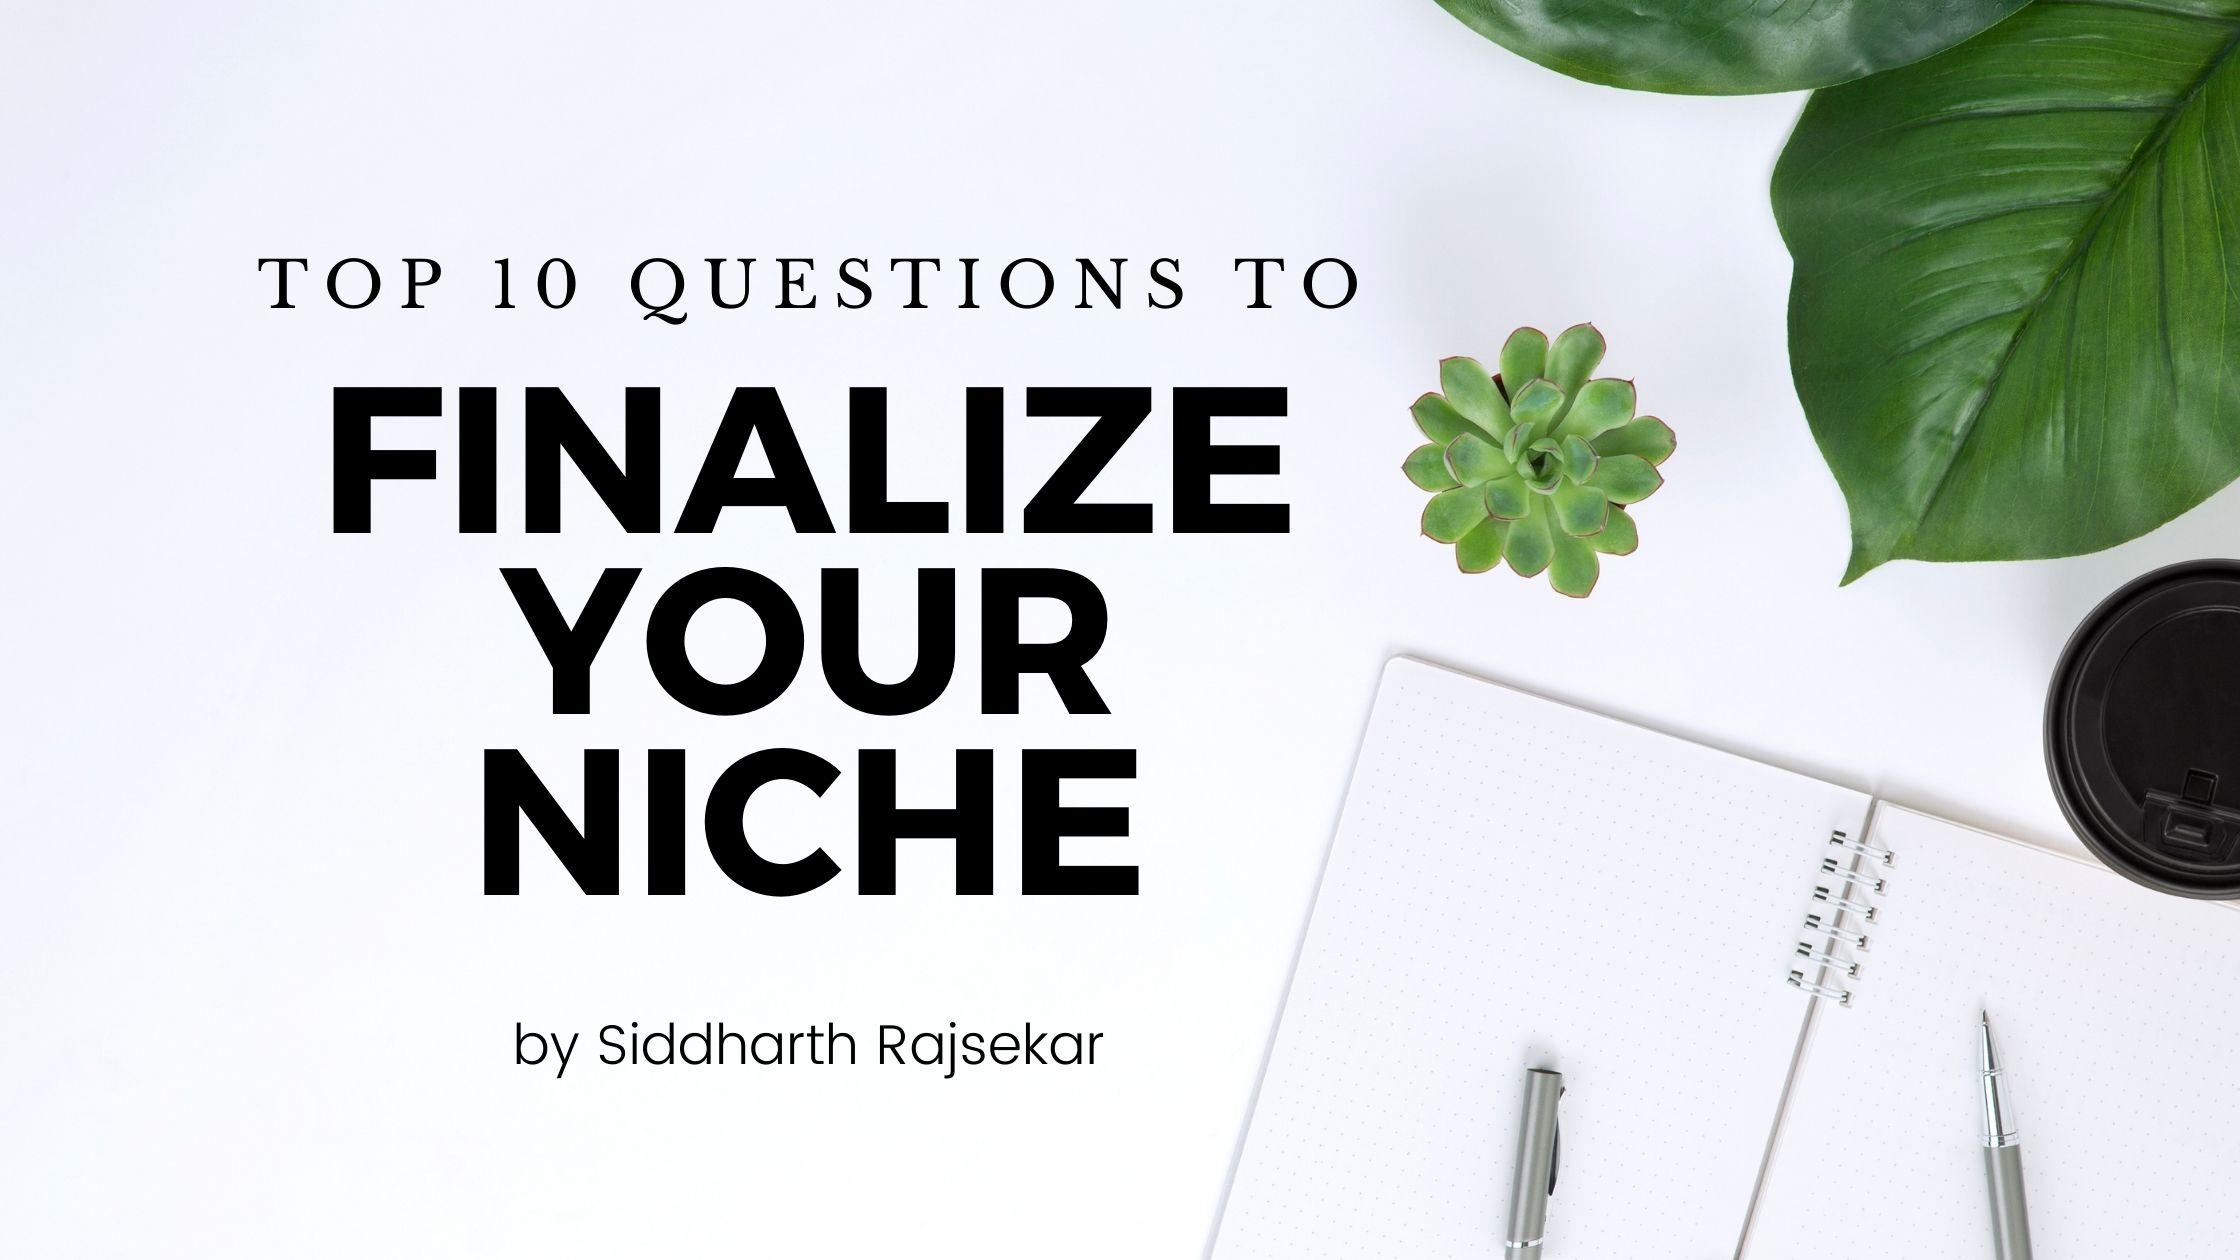 finalize your niche